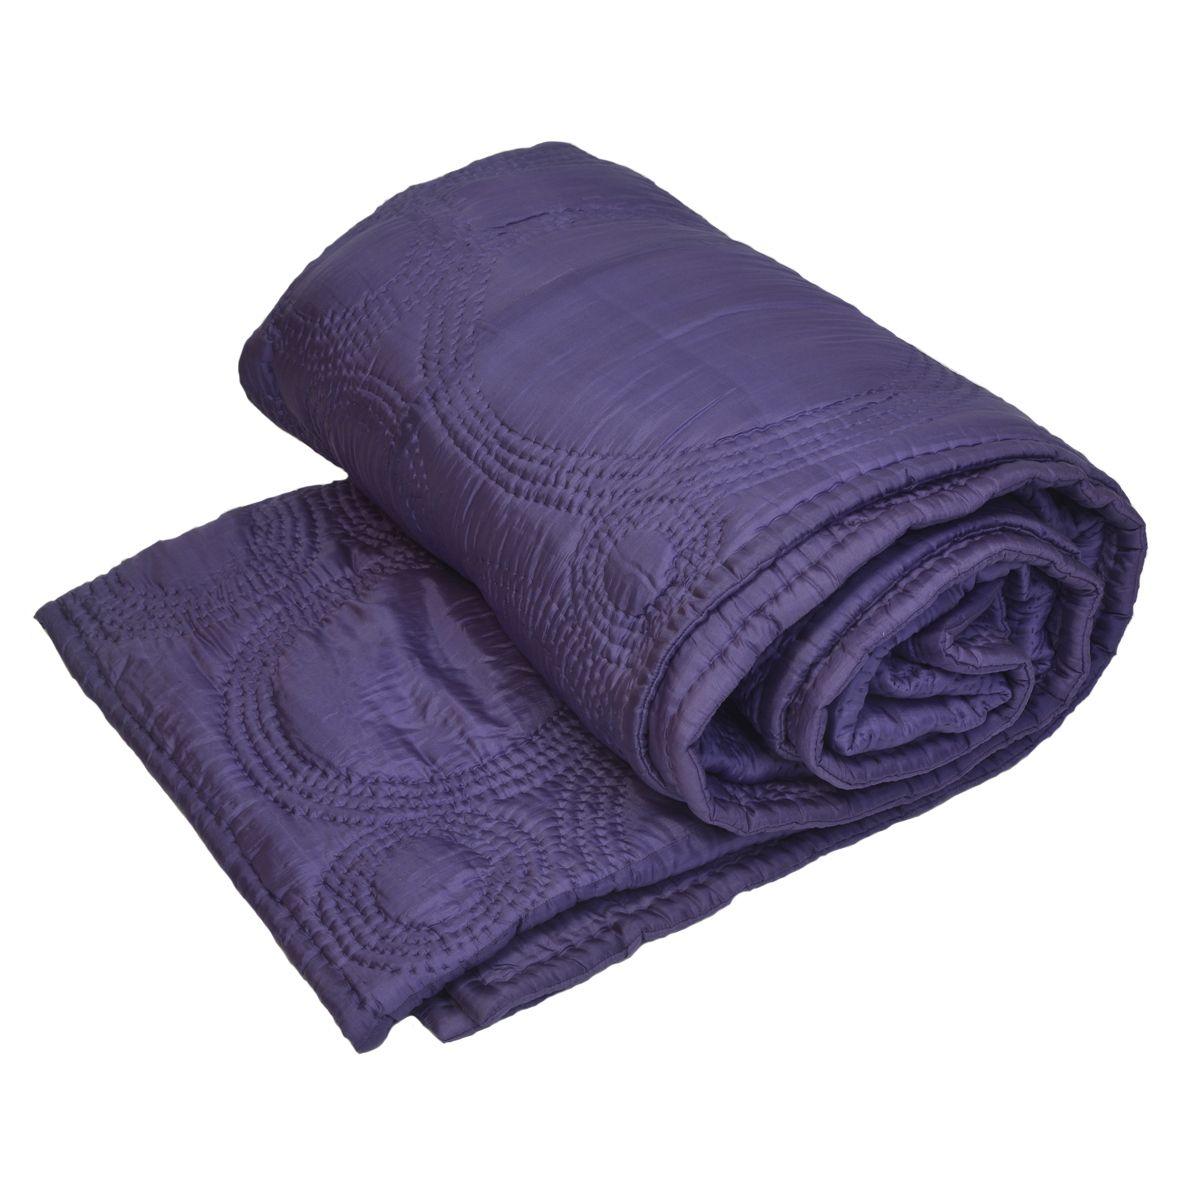 boutis couvre lits r versible mauve 240 x 240 100 soie garnissage polyester matelass. Black Bedroom Furniture Sets. Home Design Ideas